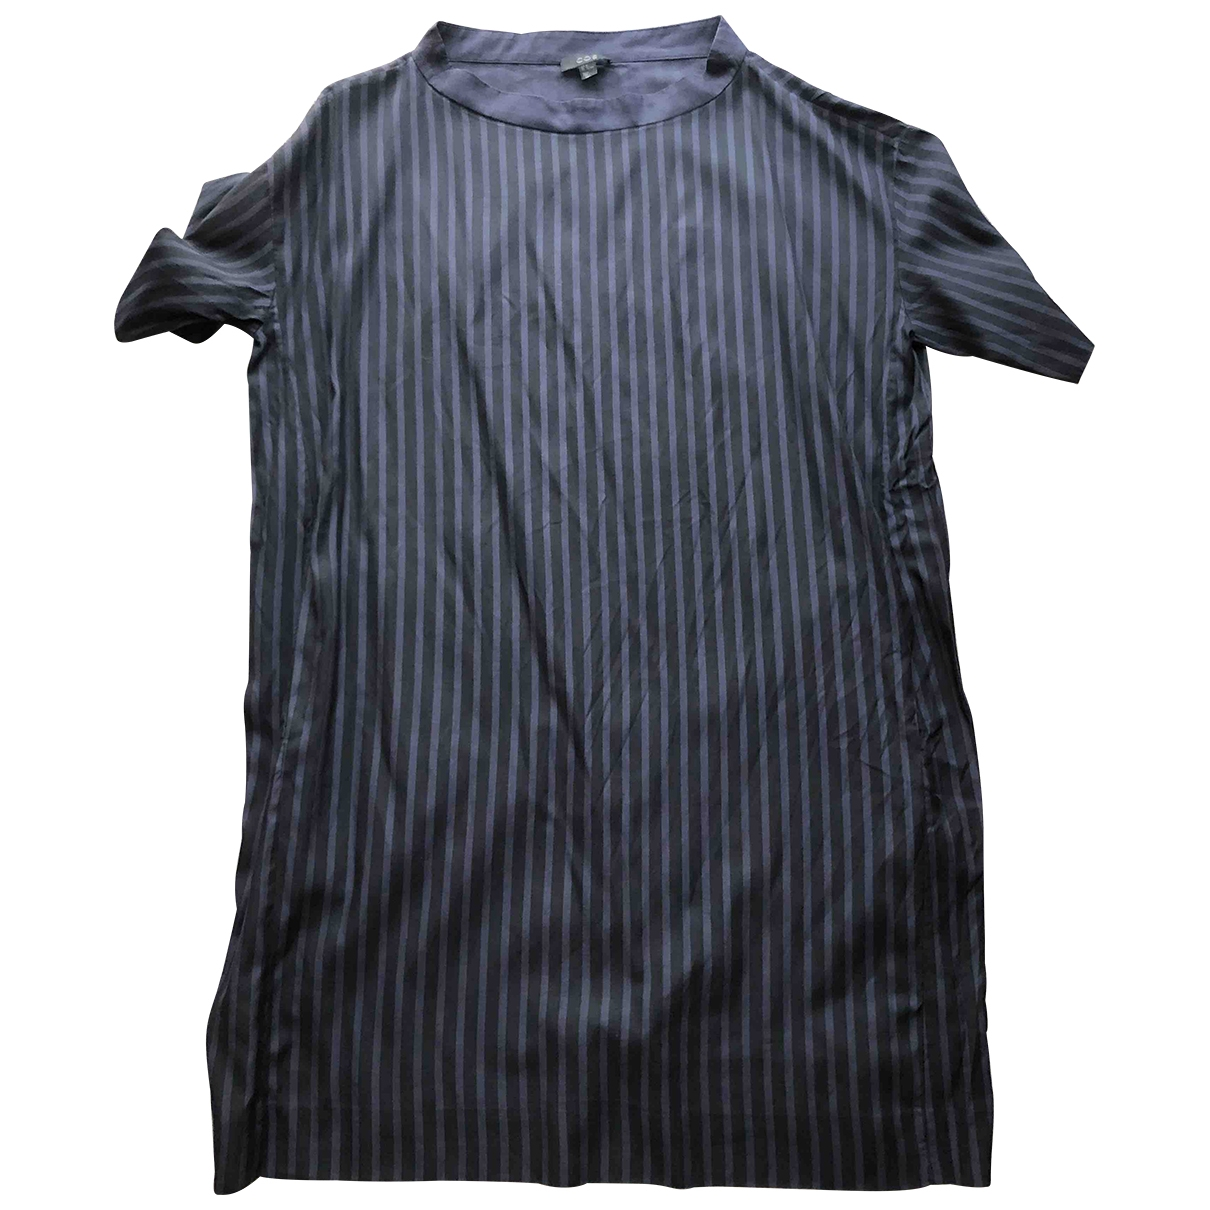 Cos \N Blue Cotton dress for Women 44 FR